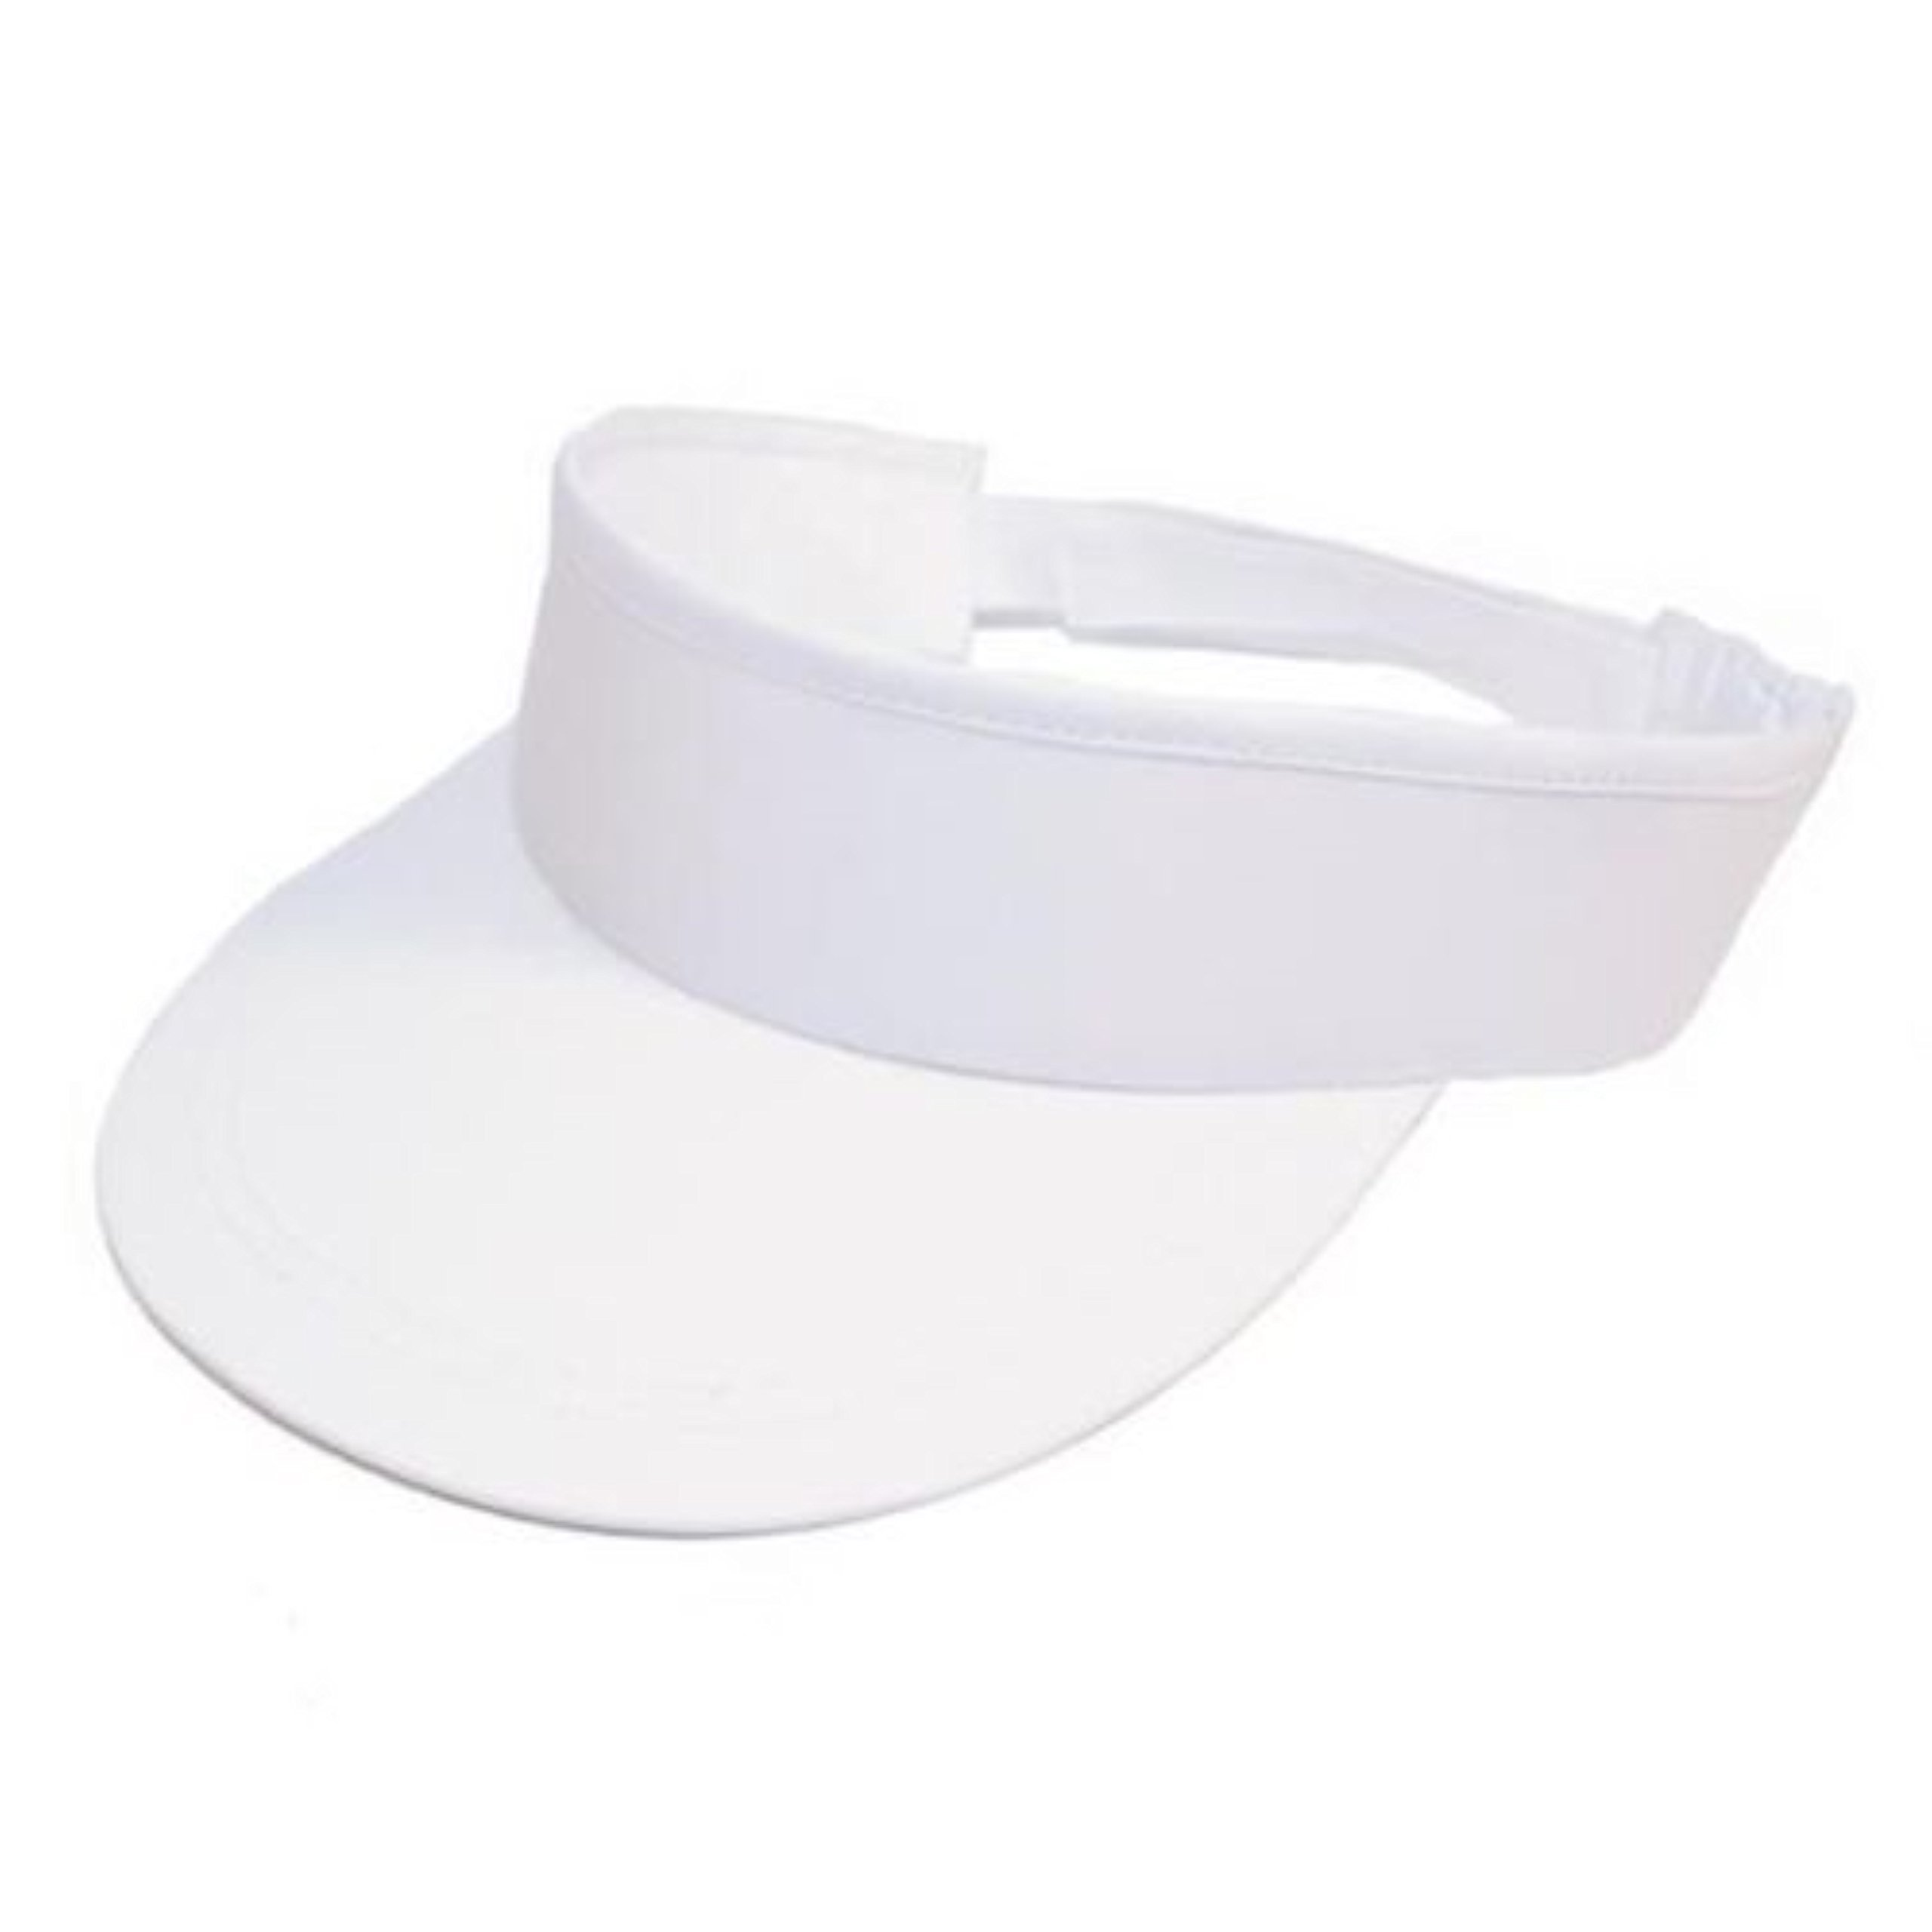 083878a5157 Visor Cotton Sun Peaked Hat Golf Tennis Sports Headband (White) product  image